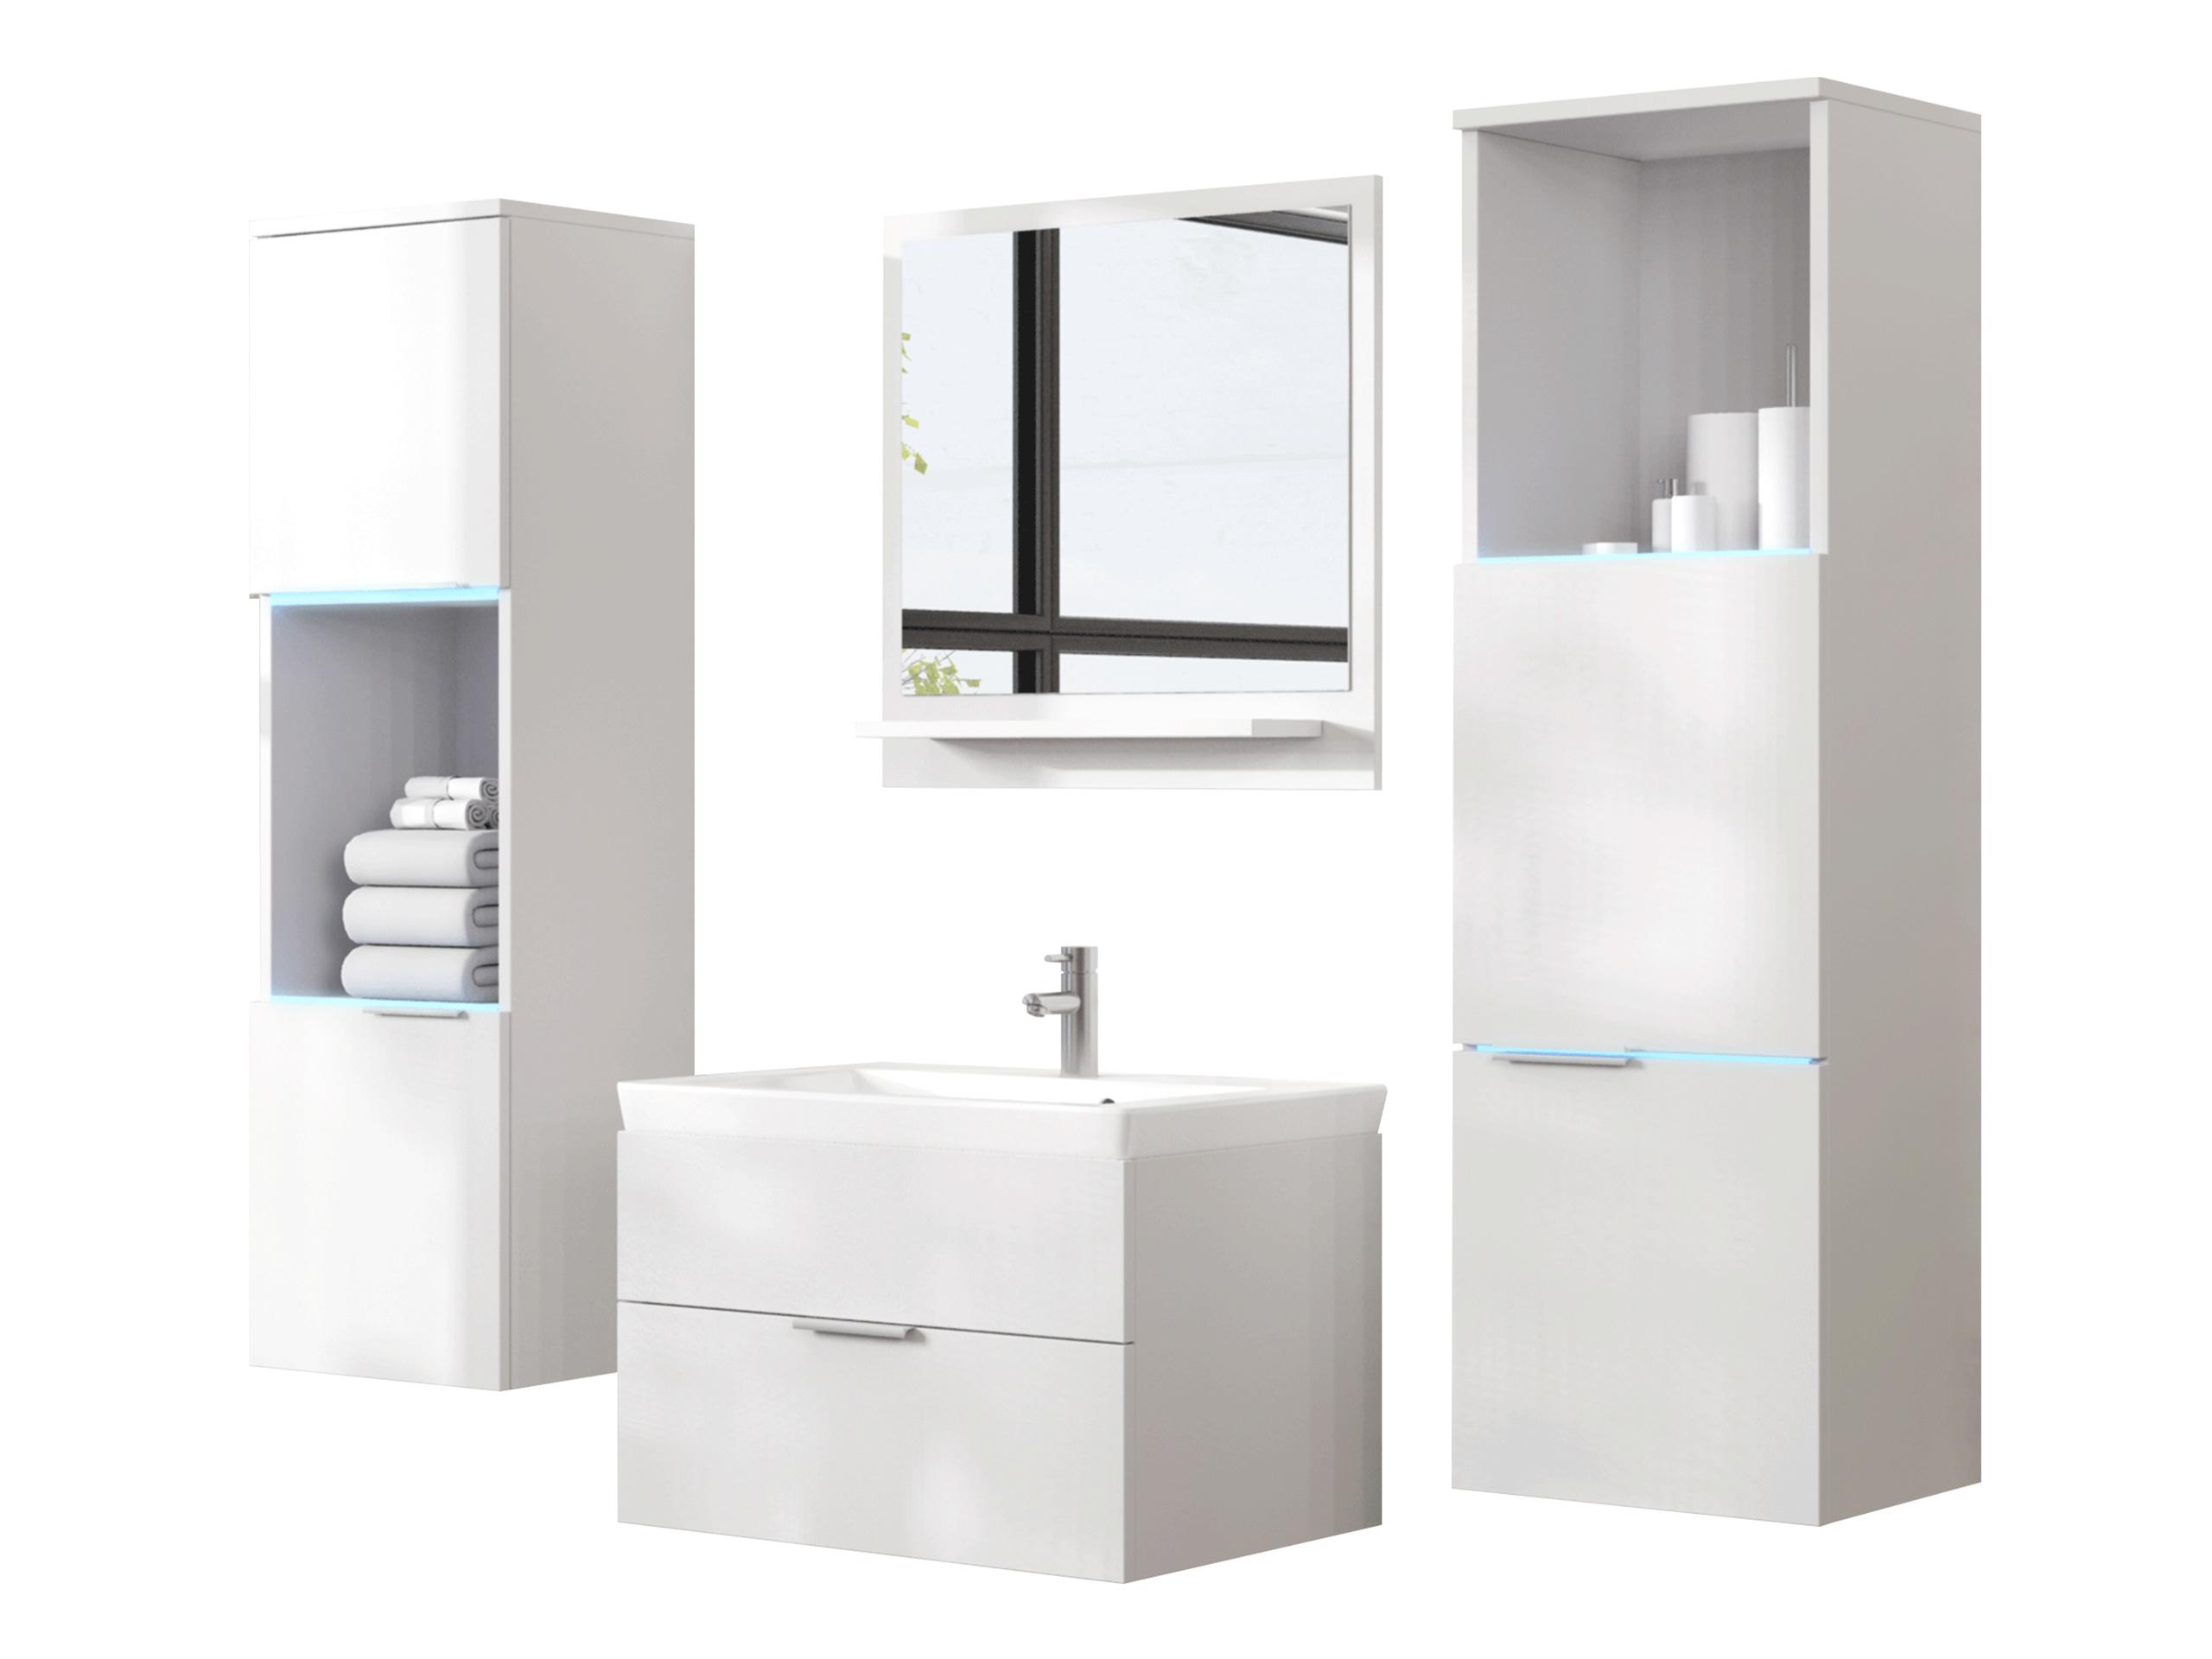 Agata Meble łazienkowe łazienka Szafki 10 Dni 6884926934